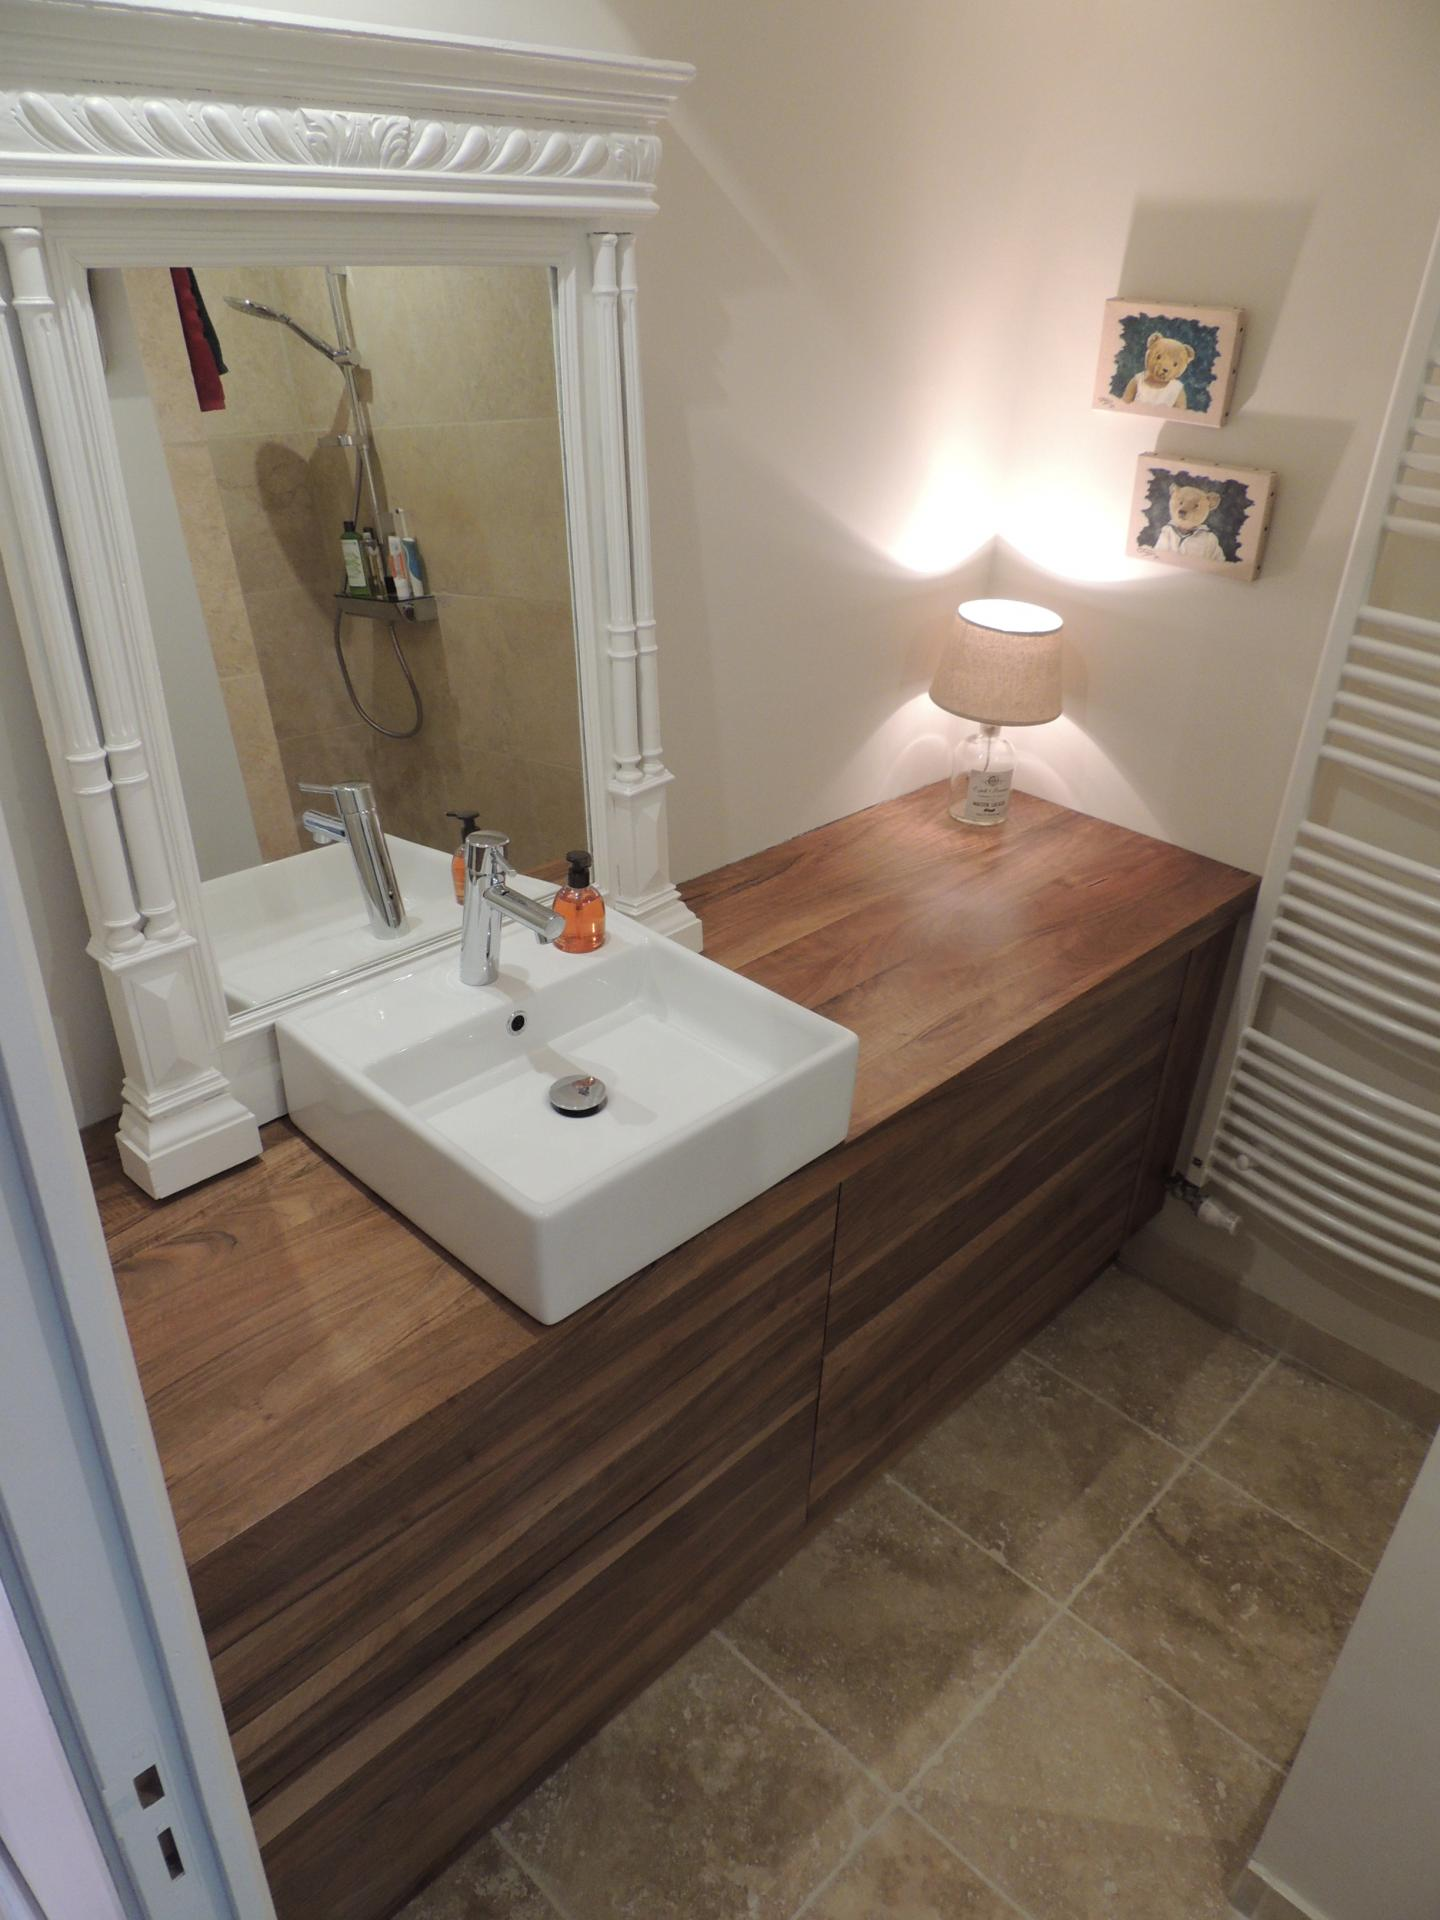 Bathroom furniture - walnut - drawer - www.ateliercannelle.com